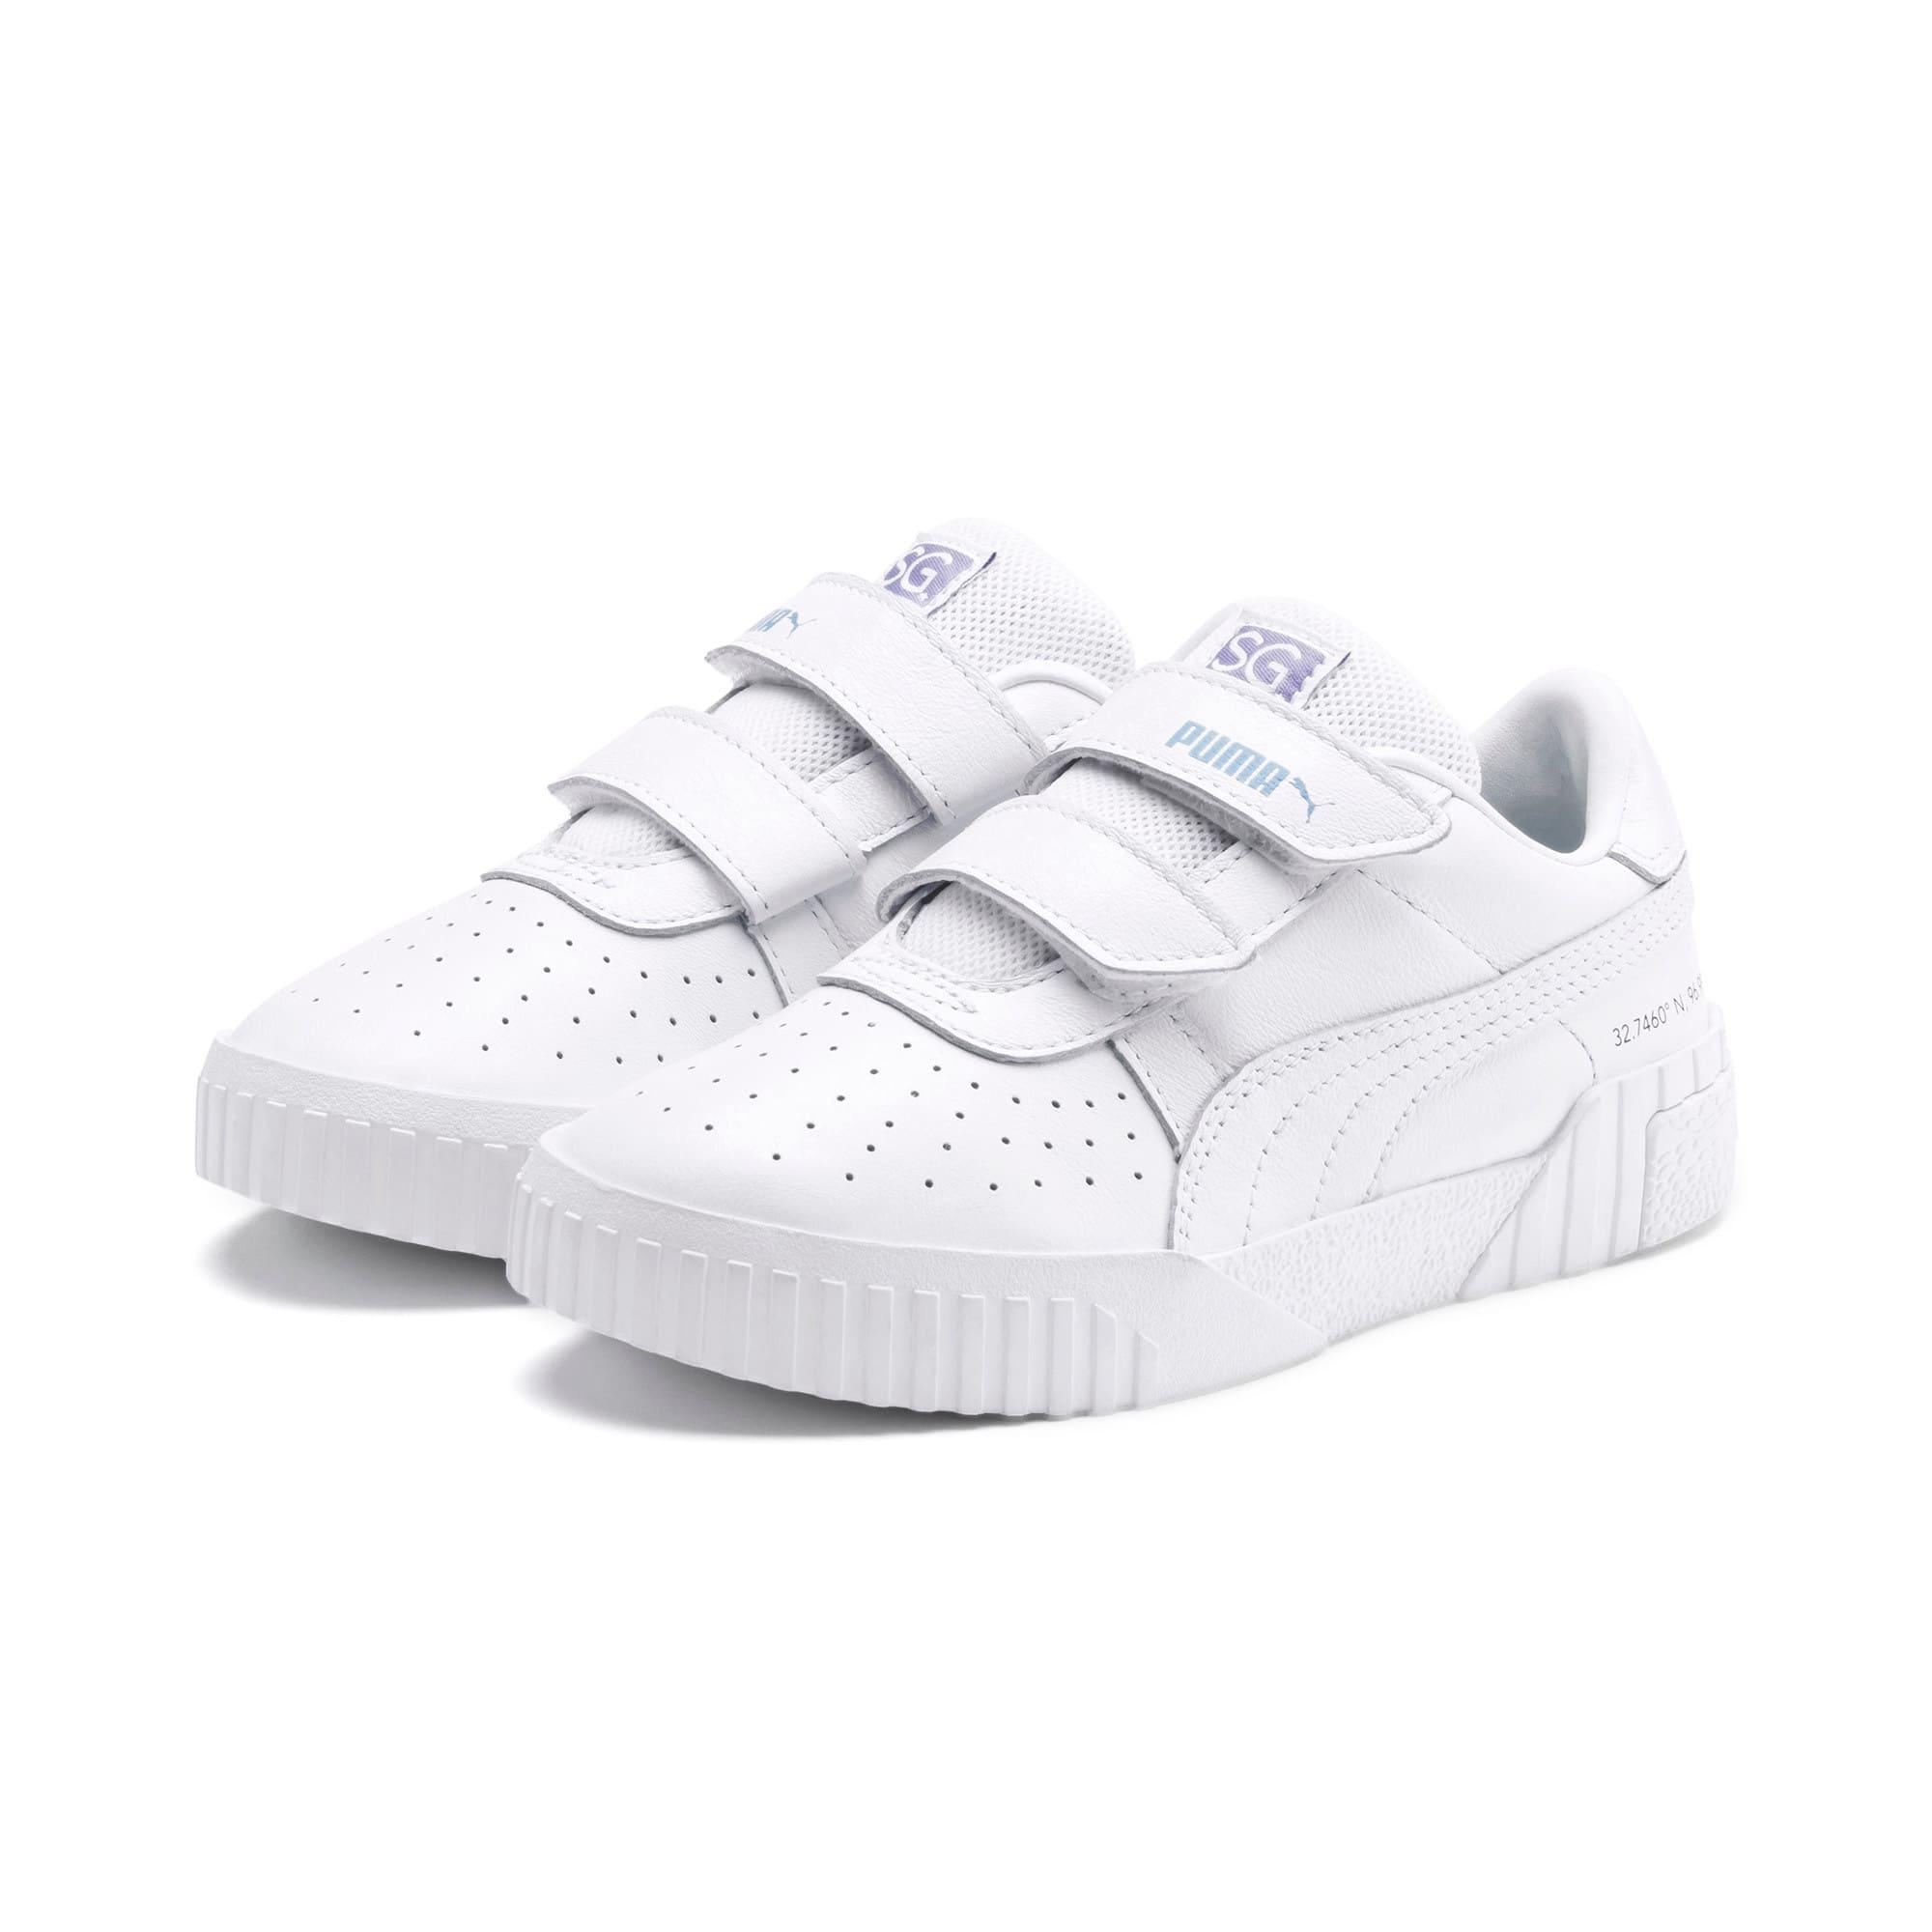 Imagen en miniatura 2 de Zapatillas de niño Cali PUMA x SELENA GOMEZ, Puma White-Puma White, mediana